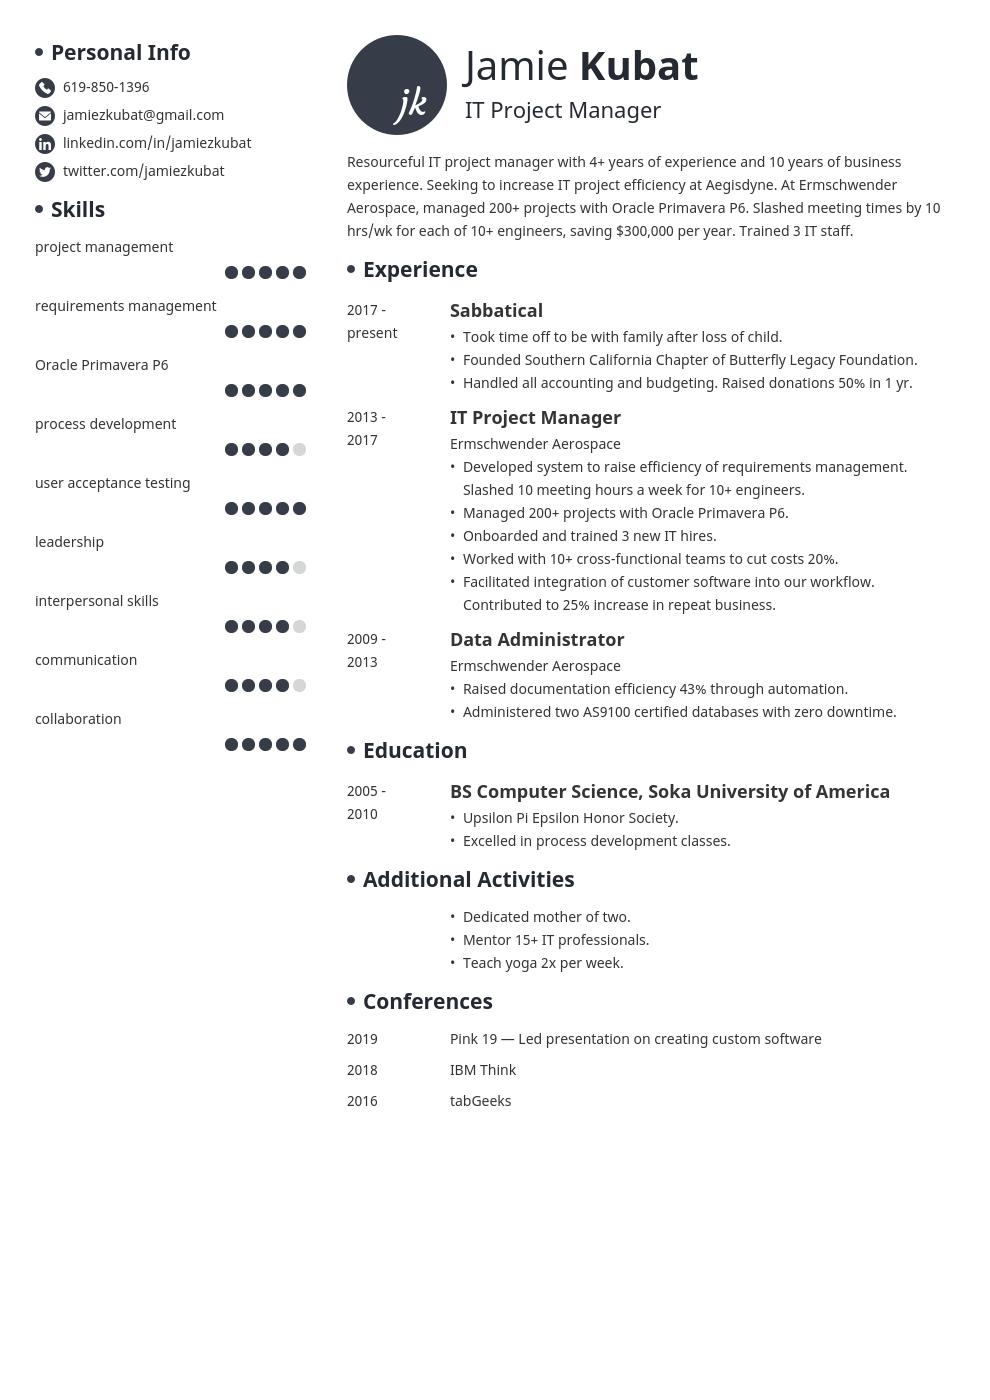 resume employment gaps template initials uk